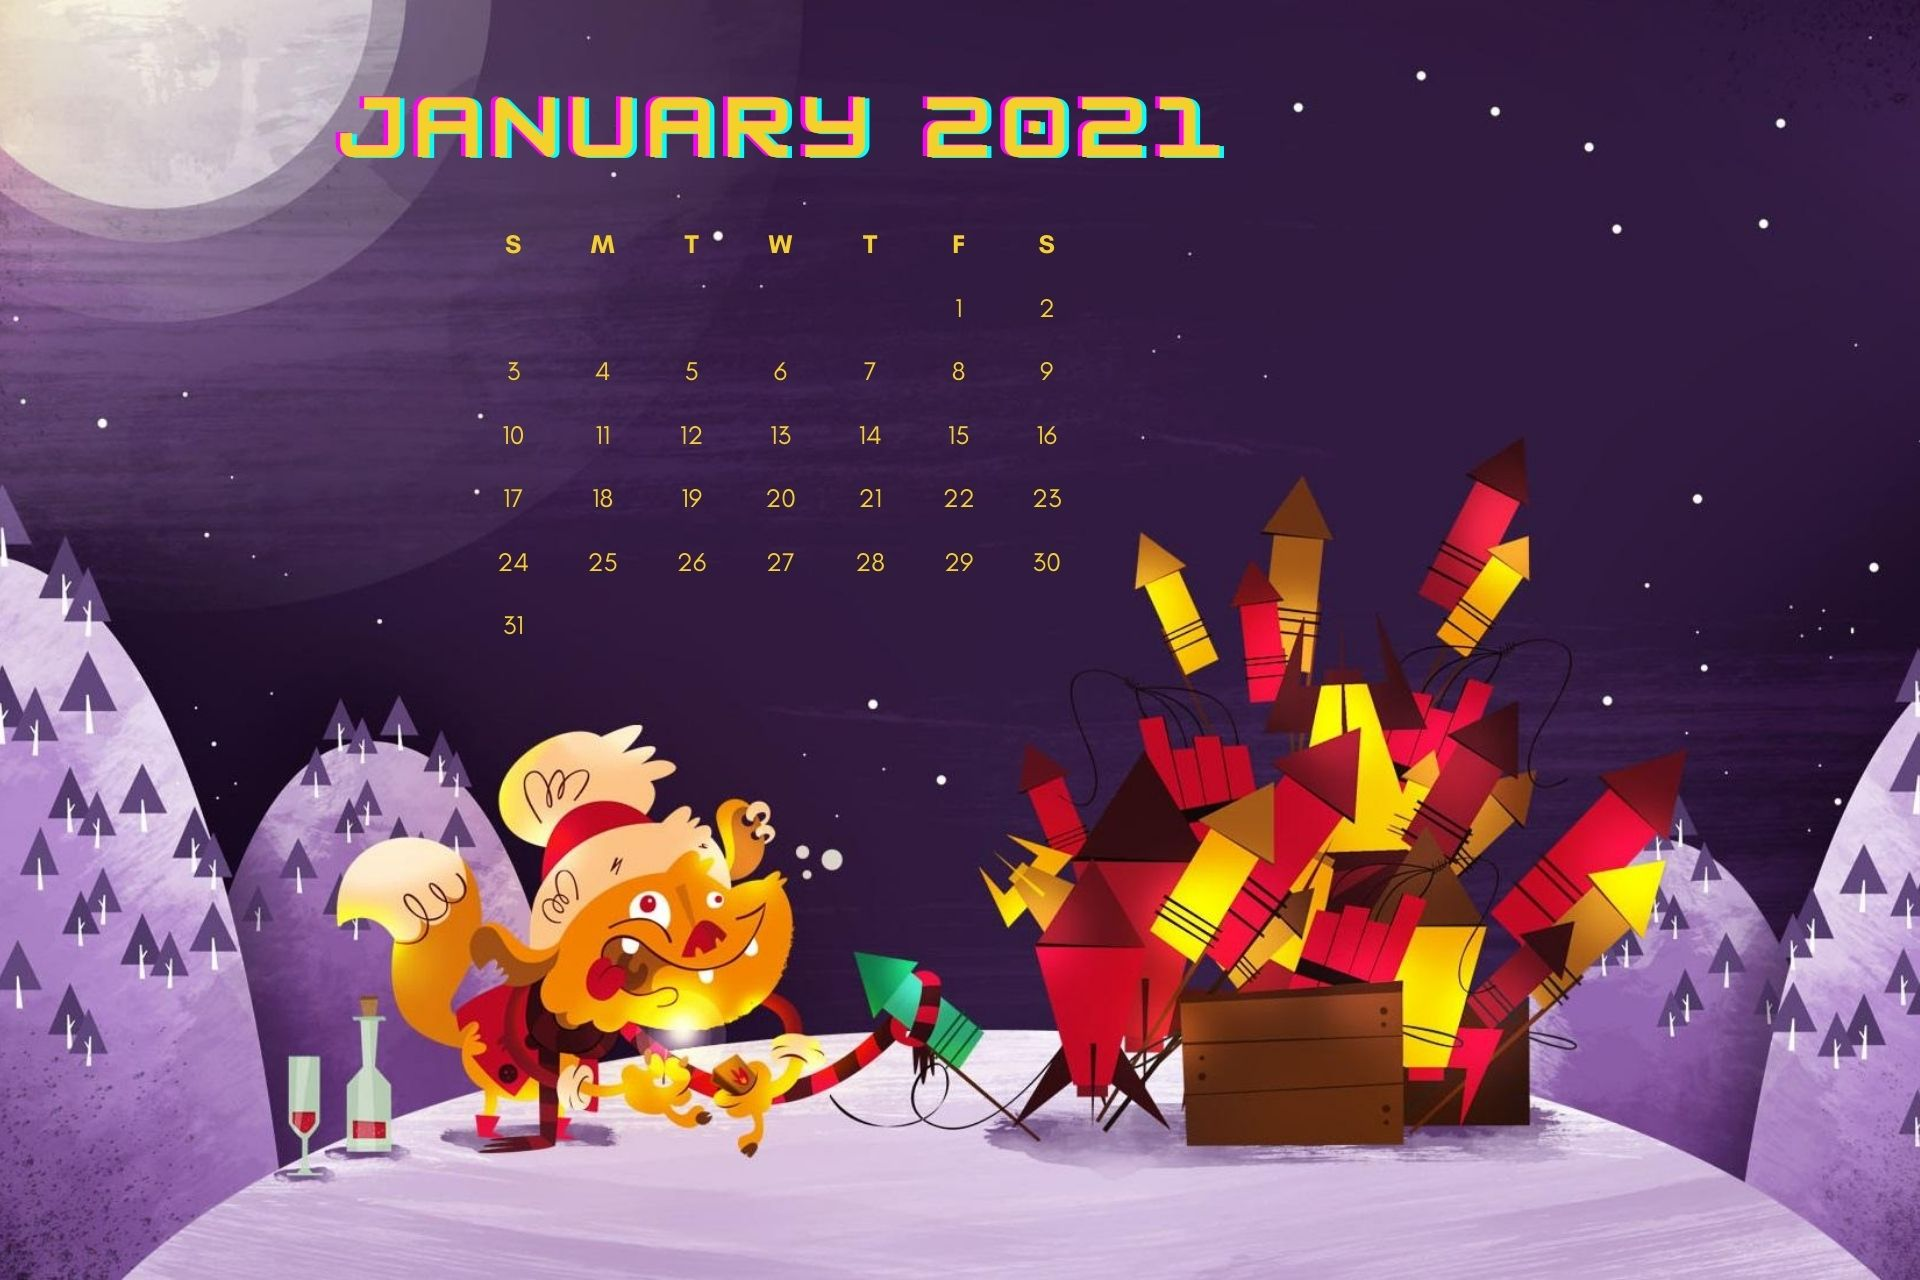 January 2021 Calendar Wallpapers Download Calendar 2021 1920x1280